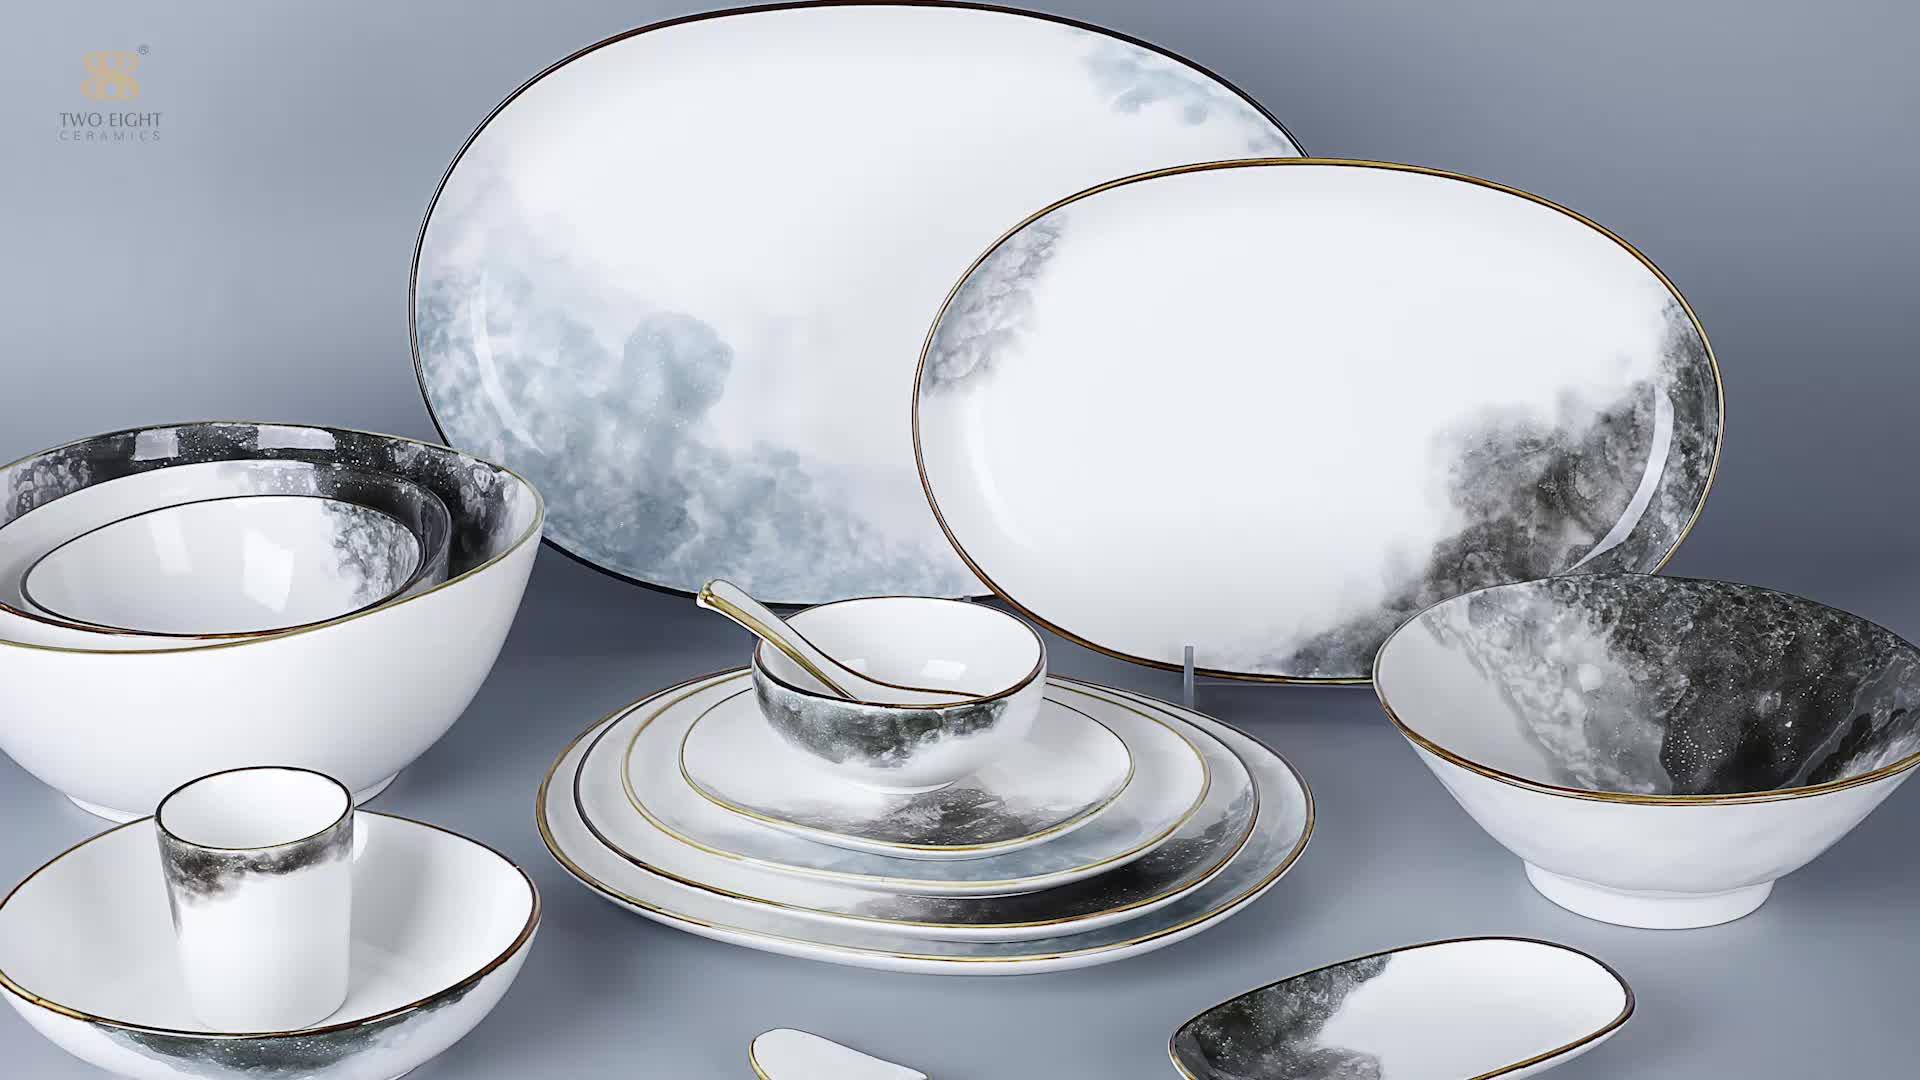 Maldives Resort Wholesale Chaozhou  First Class Kitchen Plates Set Dinner, Elegance Fine Porcelain,Dinner Set Crockery<